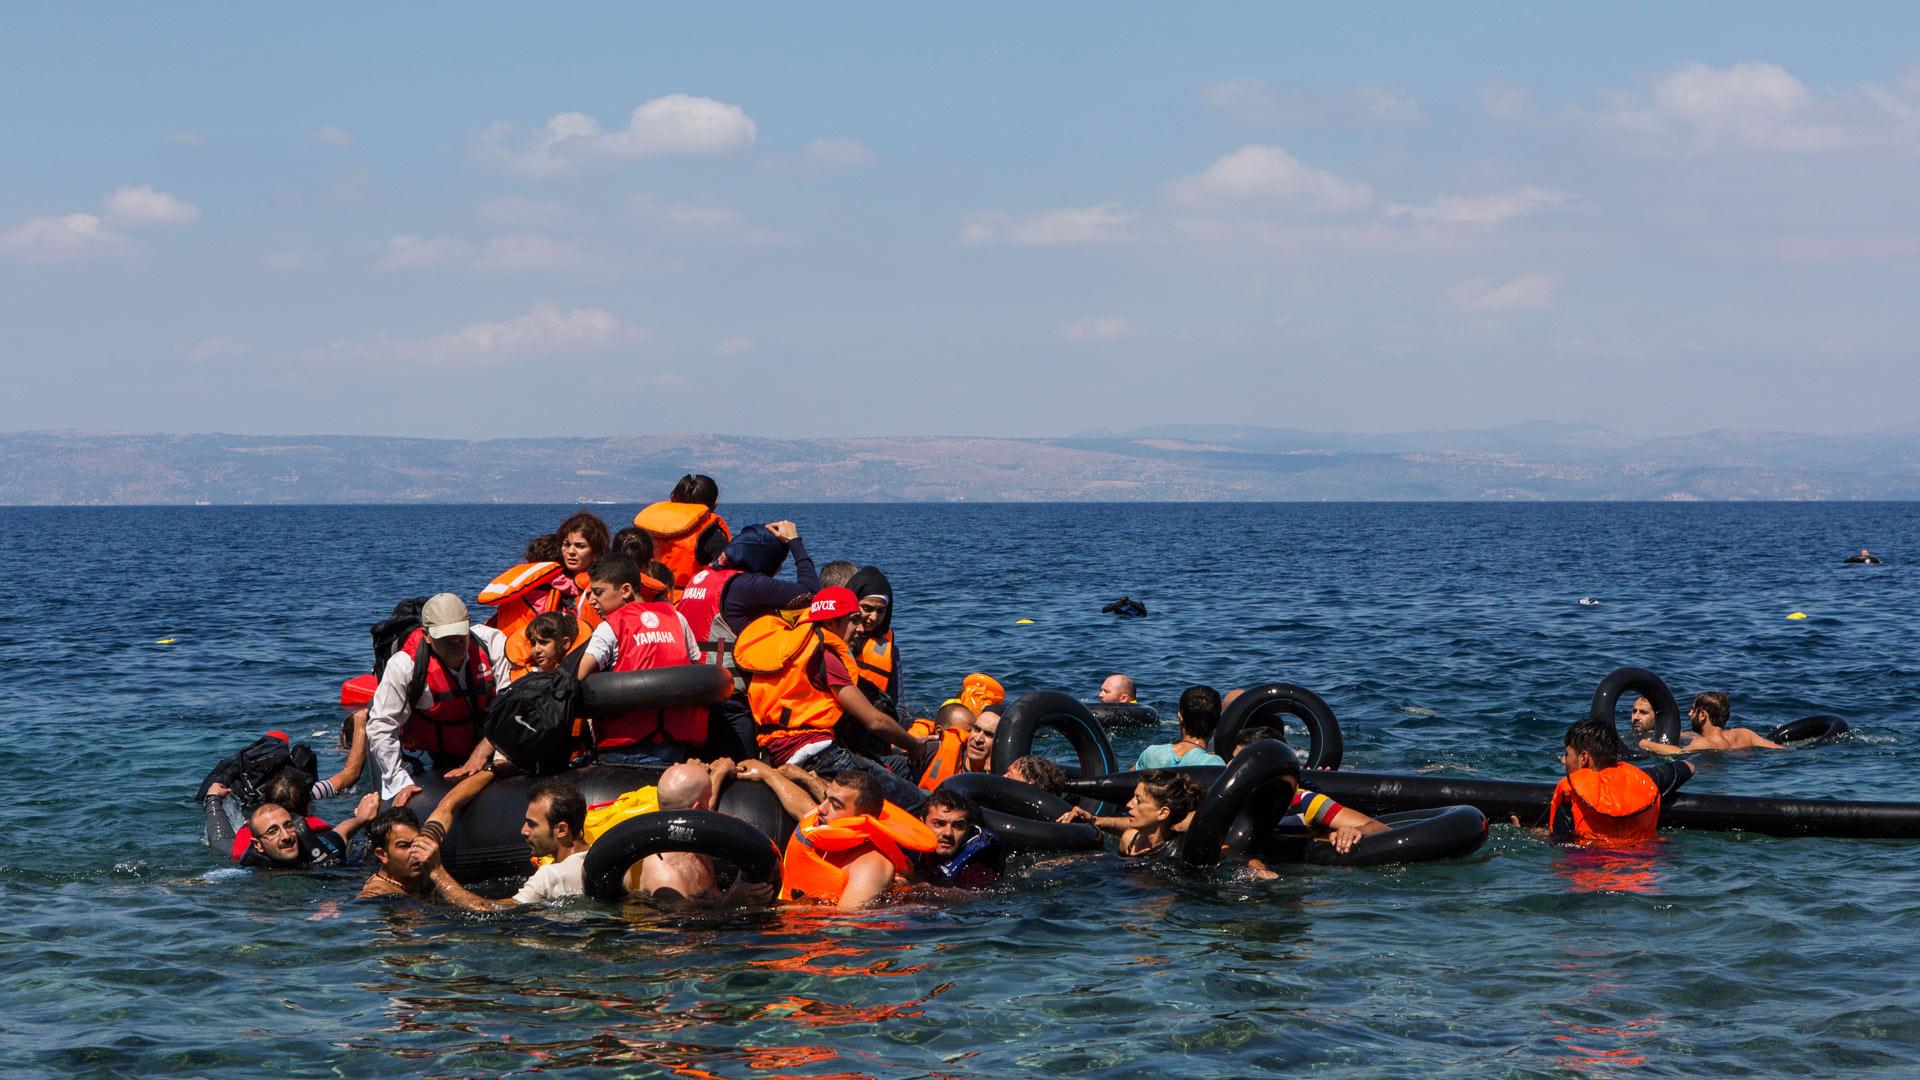 naufragi_bona_UNHCR_Ivor Prickett